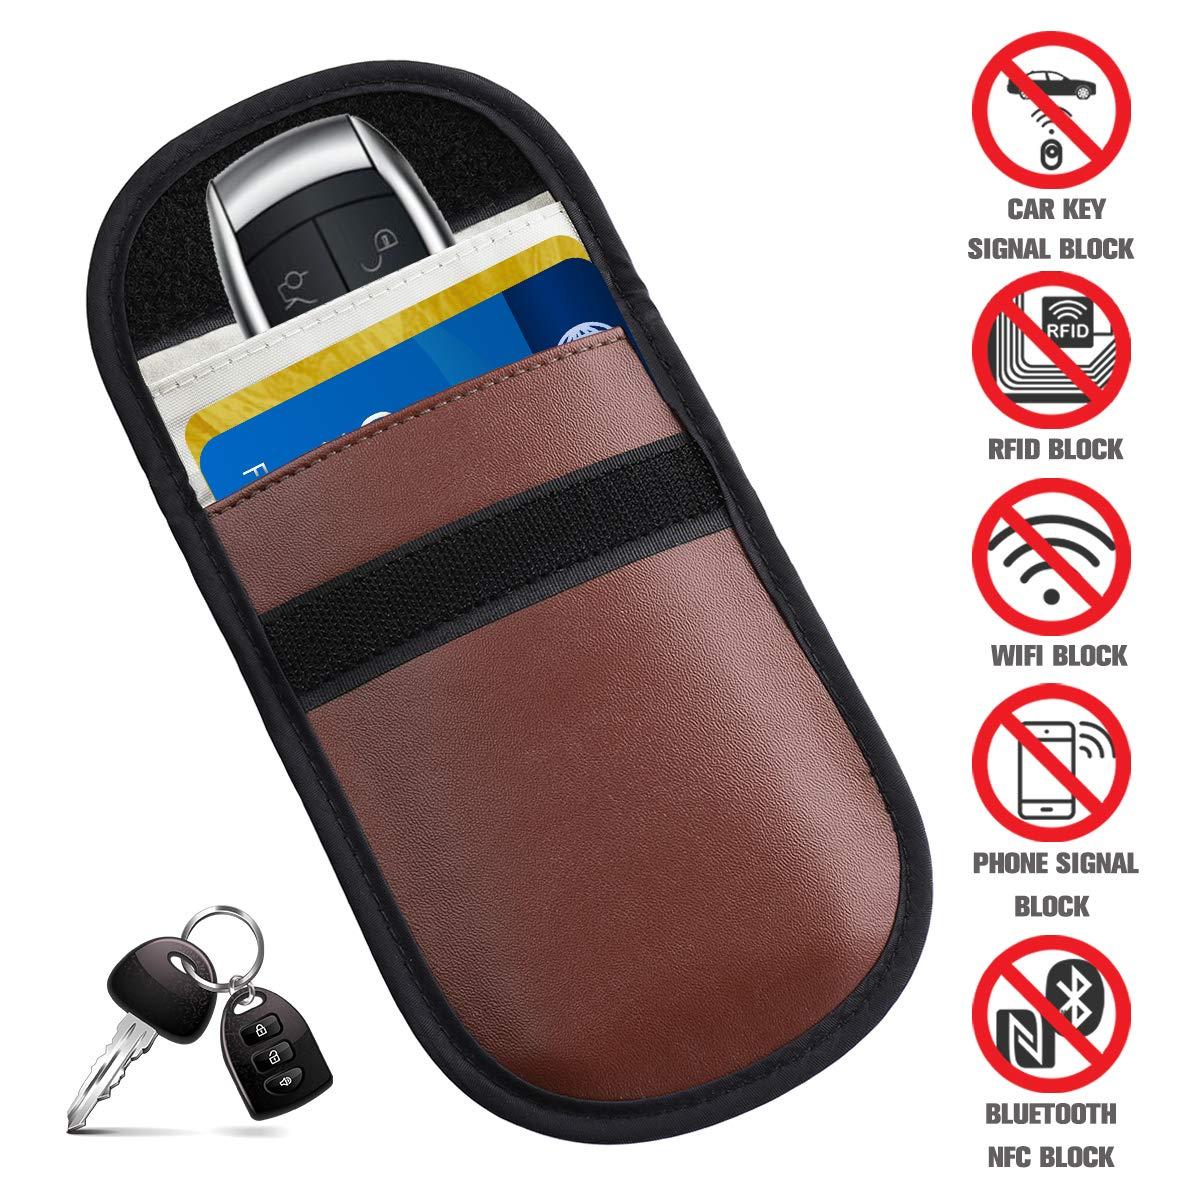 Tvird Car Key Signal Blocker Pouch, PU leather Keyless Car Key Signal Blocker | Anti Theft Fob Protector | Blocks RFID/WiFi/GSM/NFC(Pink) Tvirdfgdfbgfd209